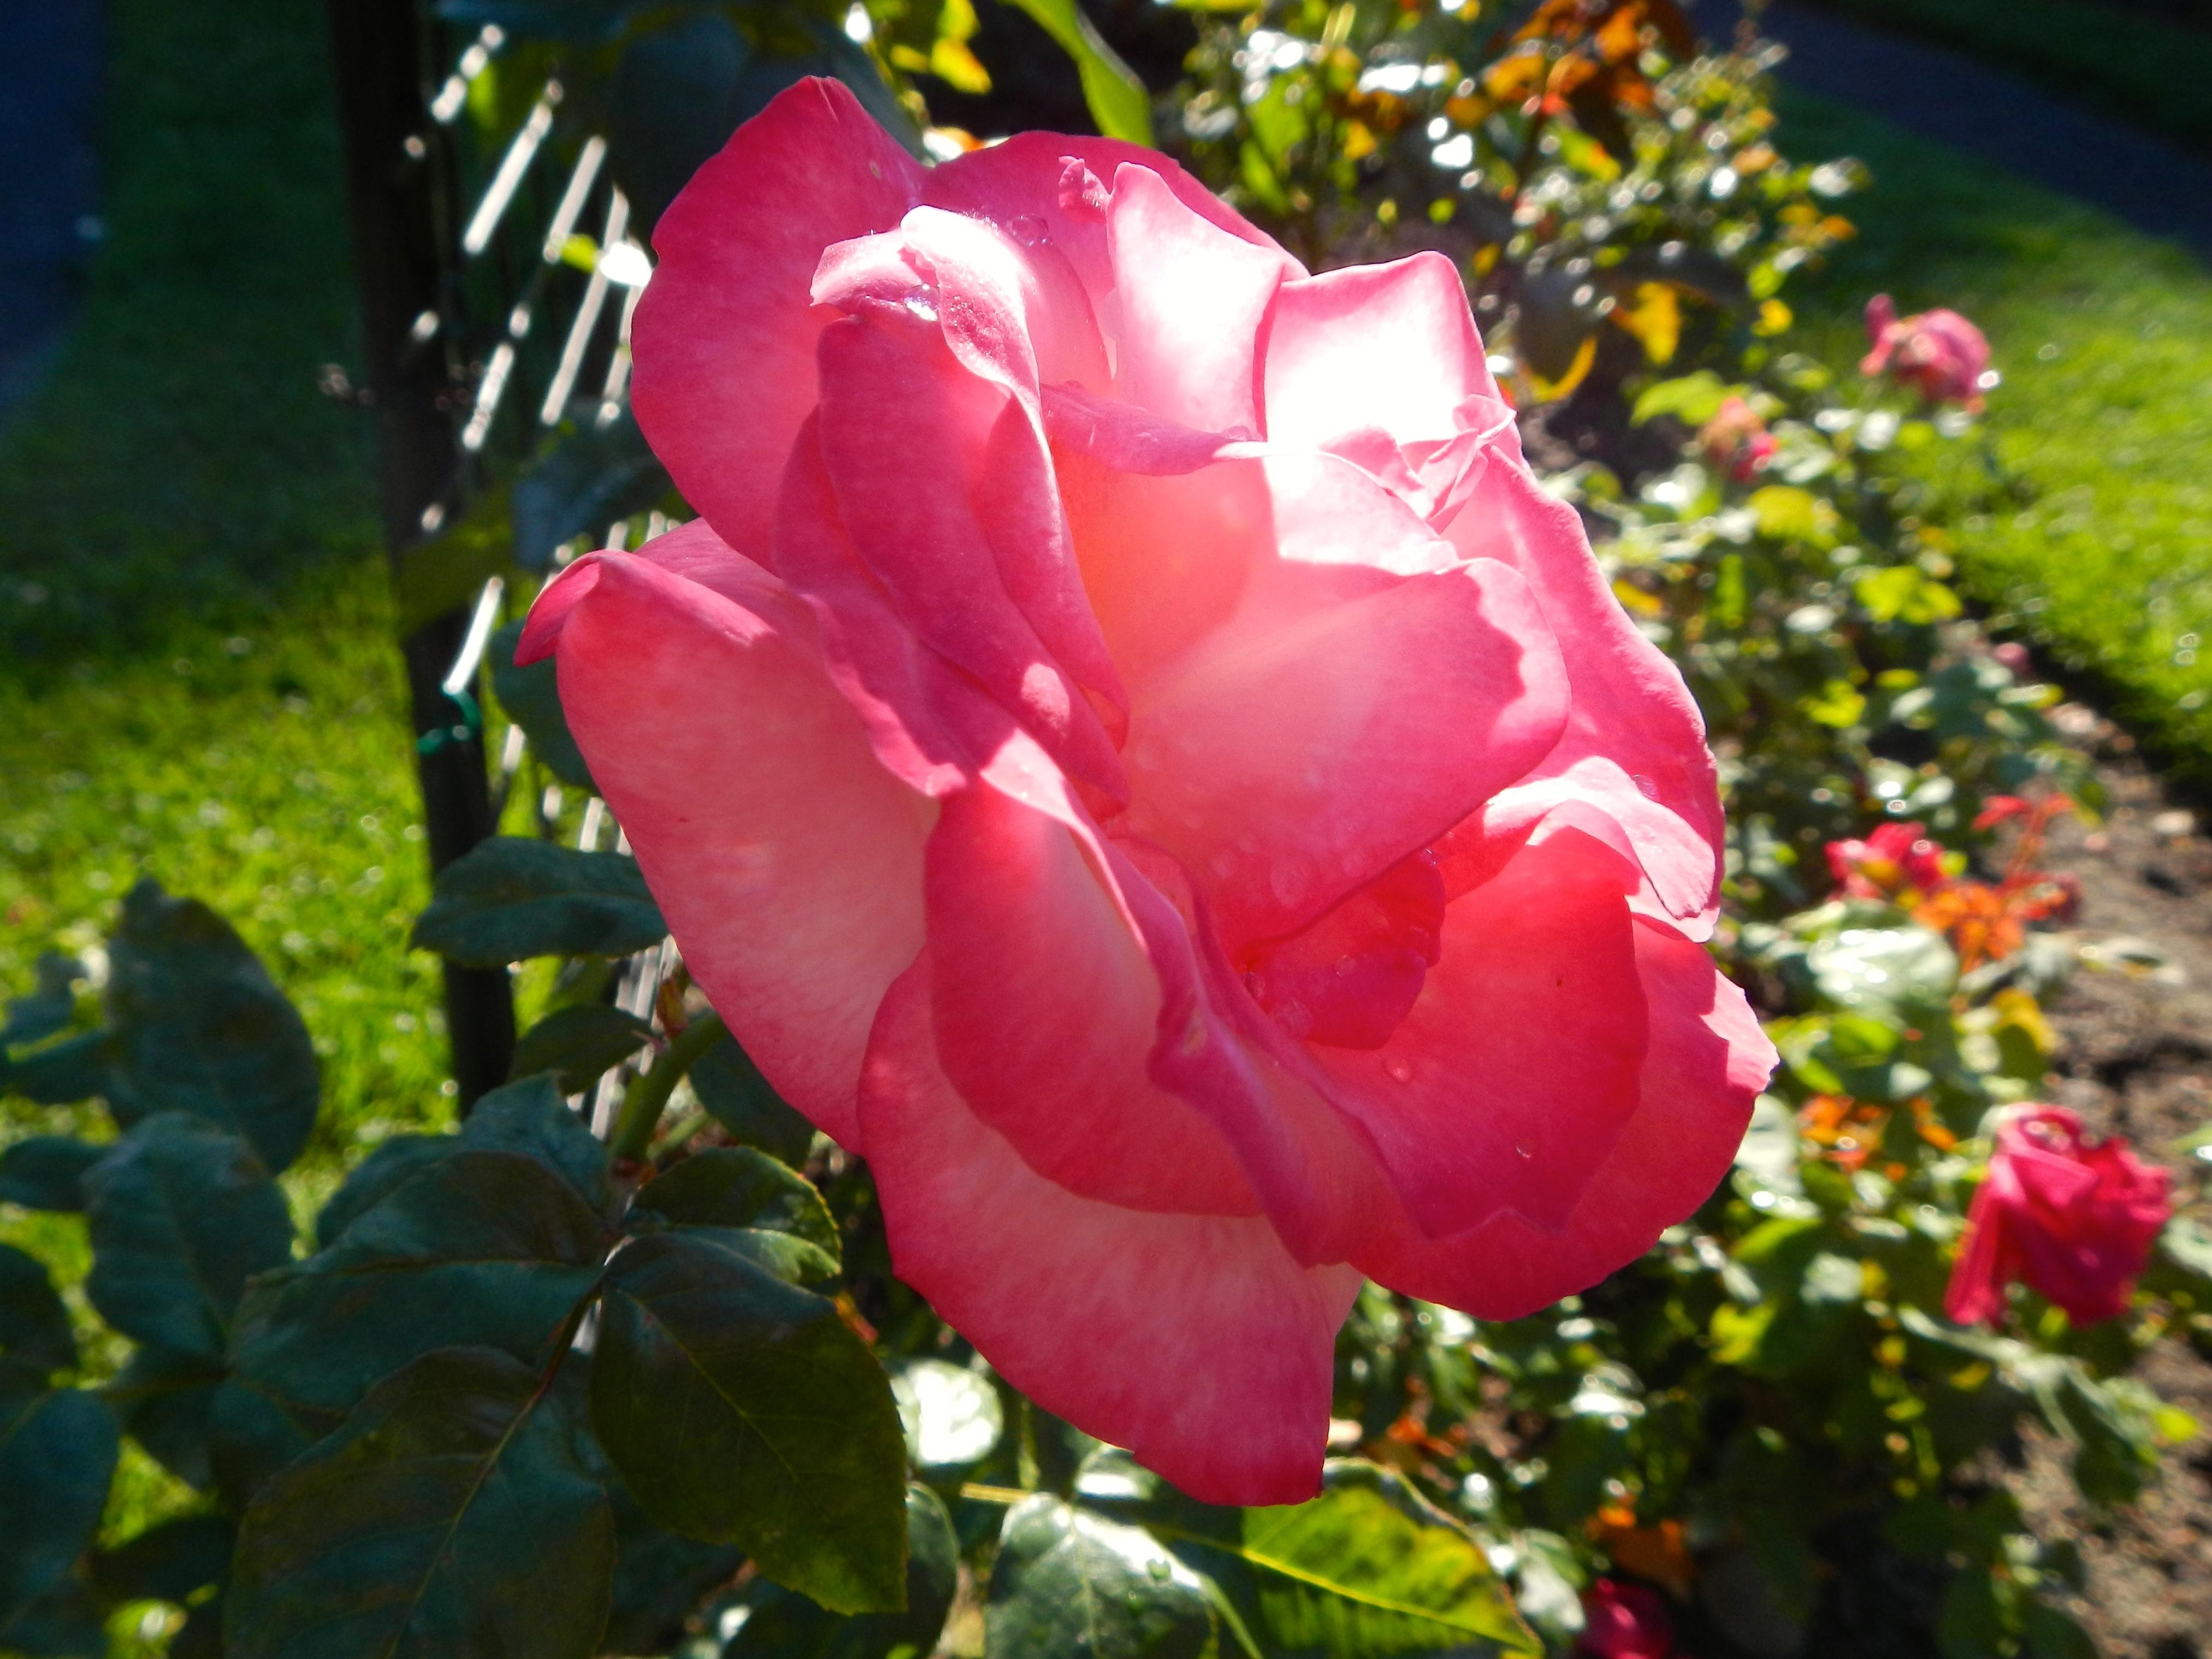 Pink rose in sunshine